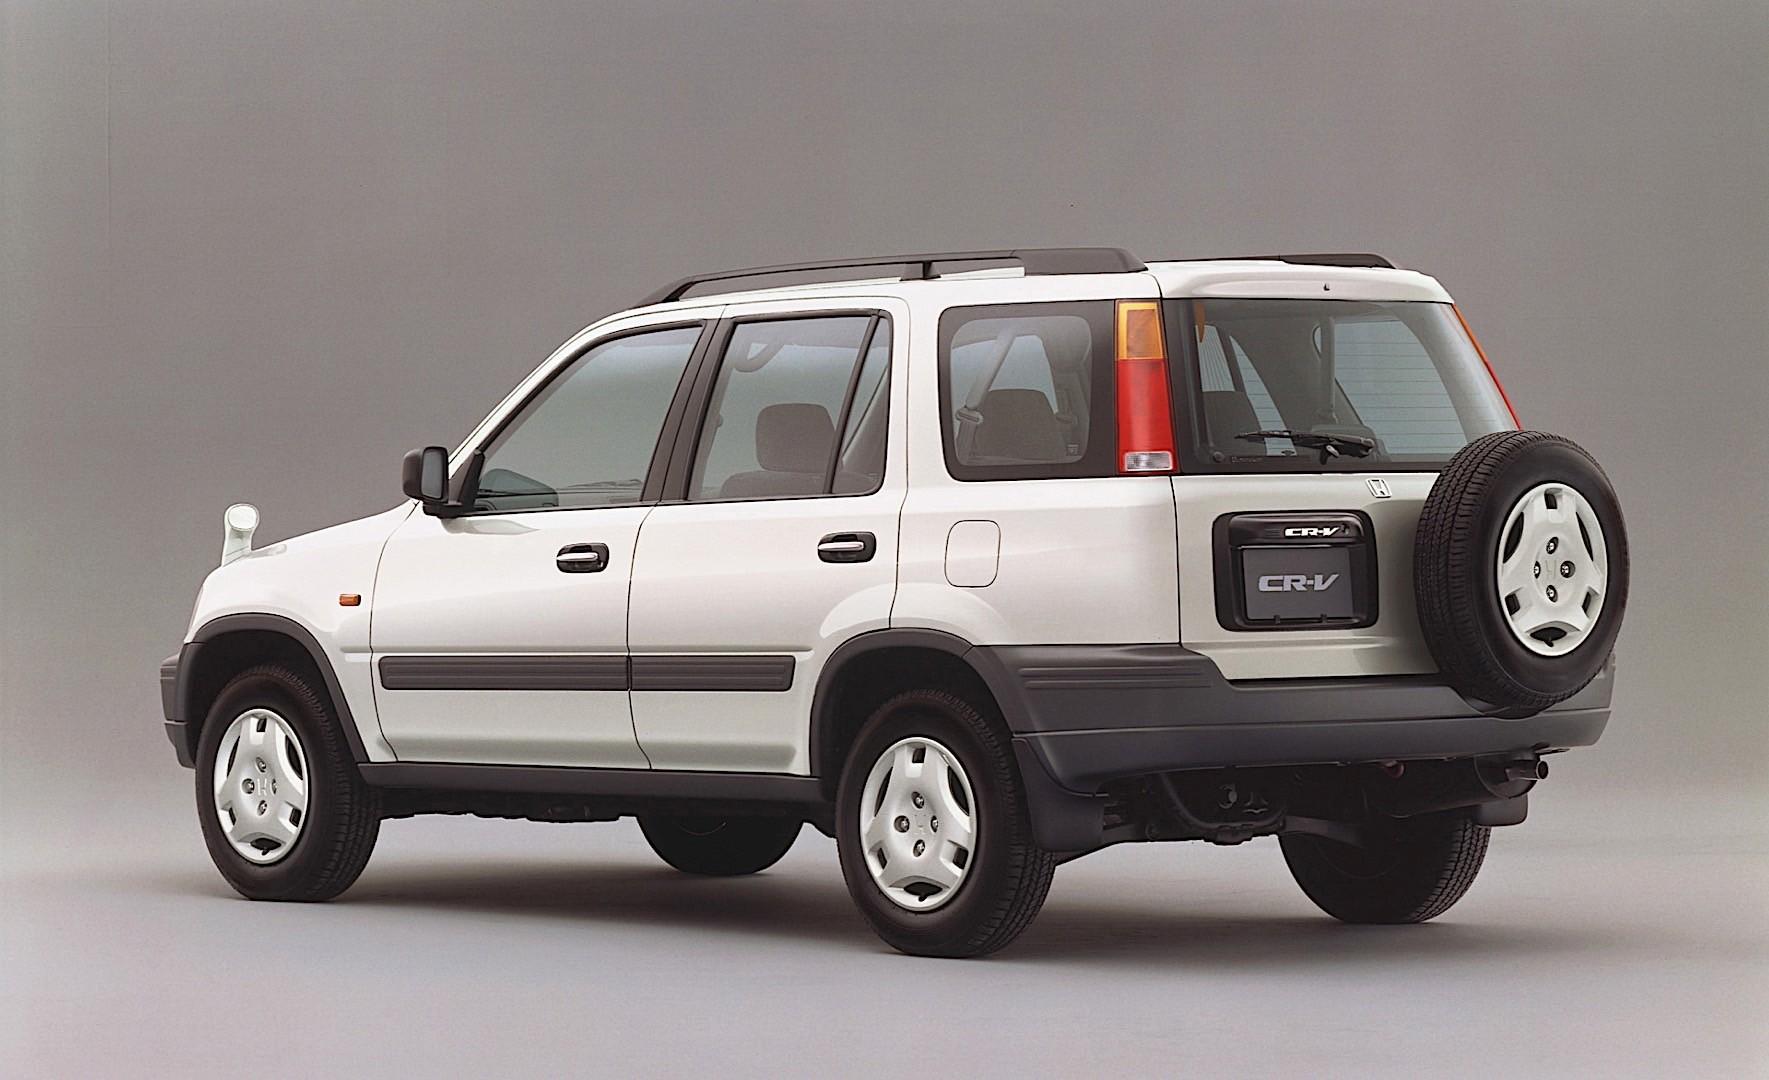 Honda S2000 Specs >> HONDA CR-V specs & photos - 1996, 1997, 1998, 1999, 2000 ...